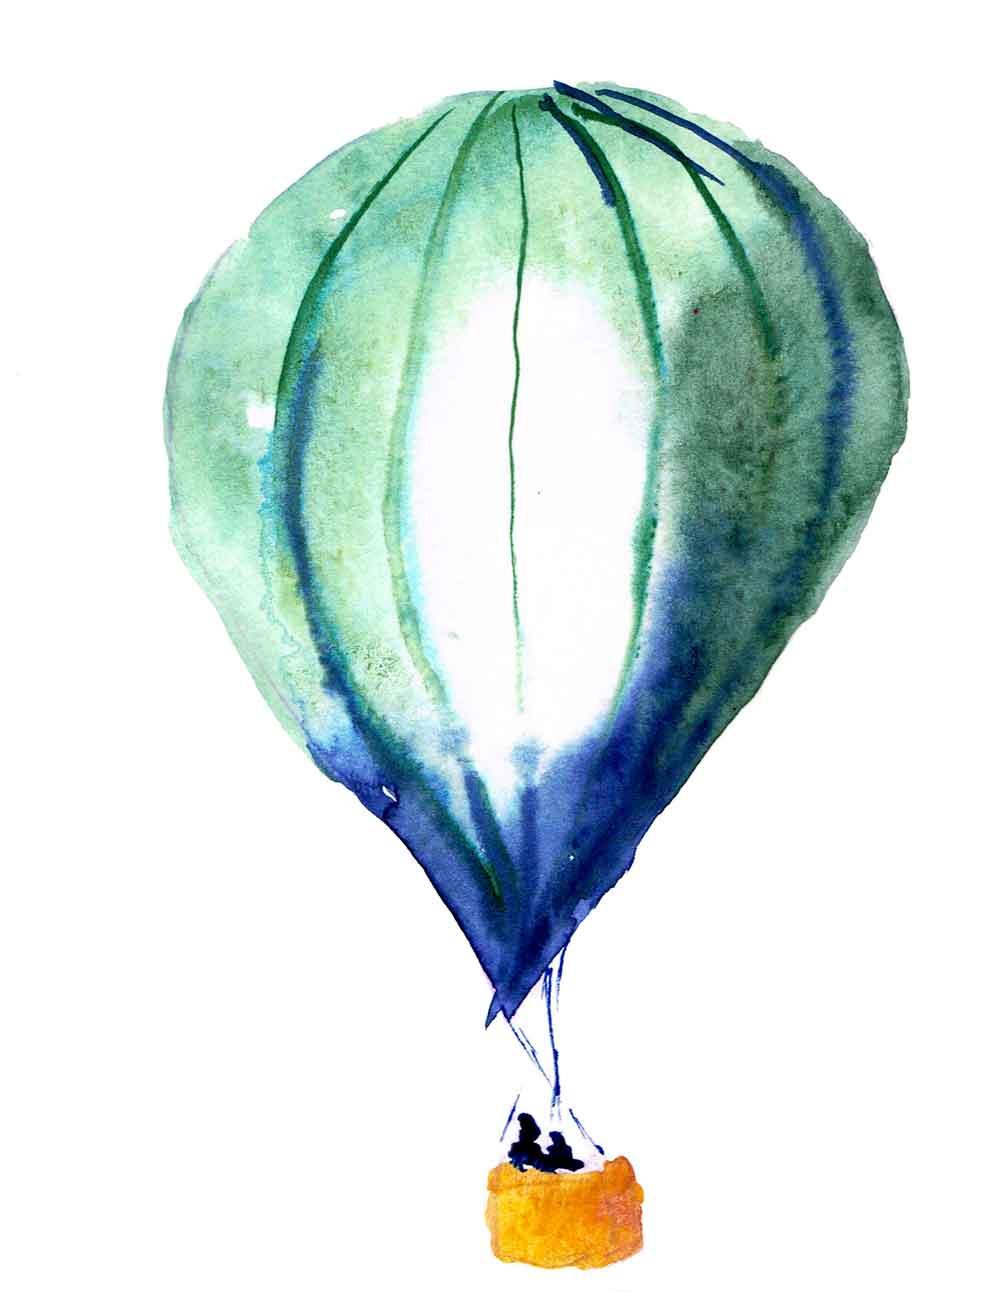 Cascade-Green-balloon-kw.jpg